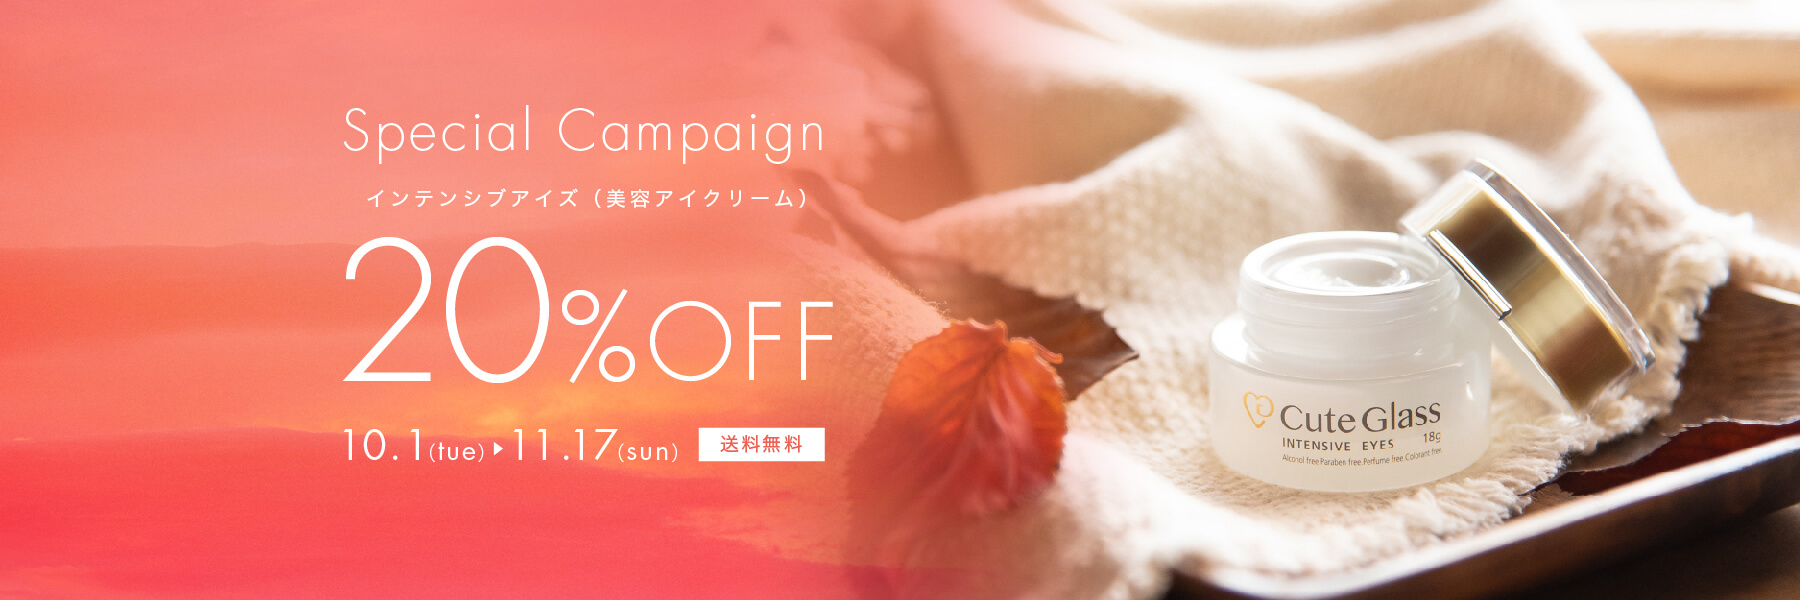 Special Campaign インテンシブアイズ(美容アイクリーム)送料無料 20%OFF 10.1(tue)~11.17(sun)